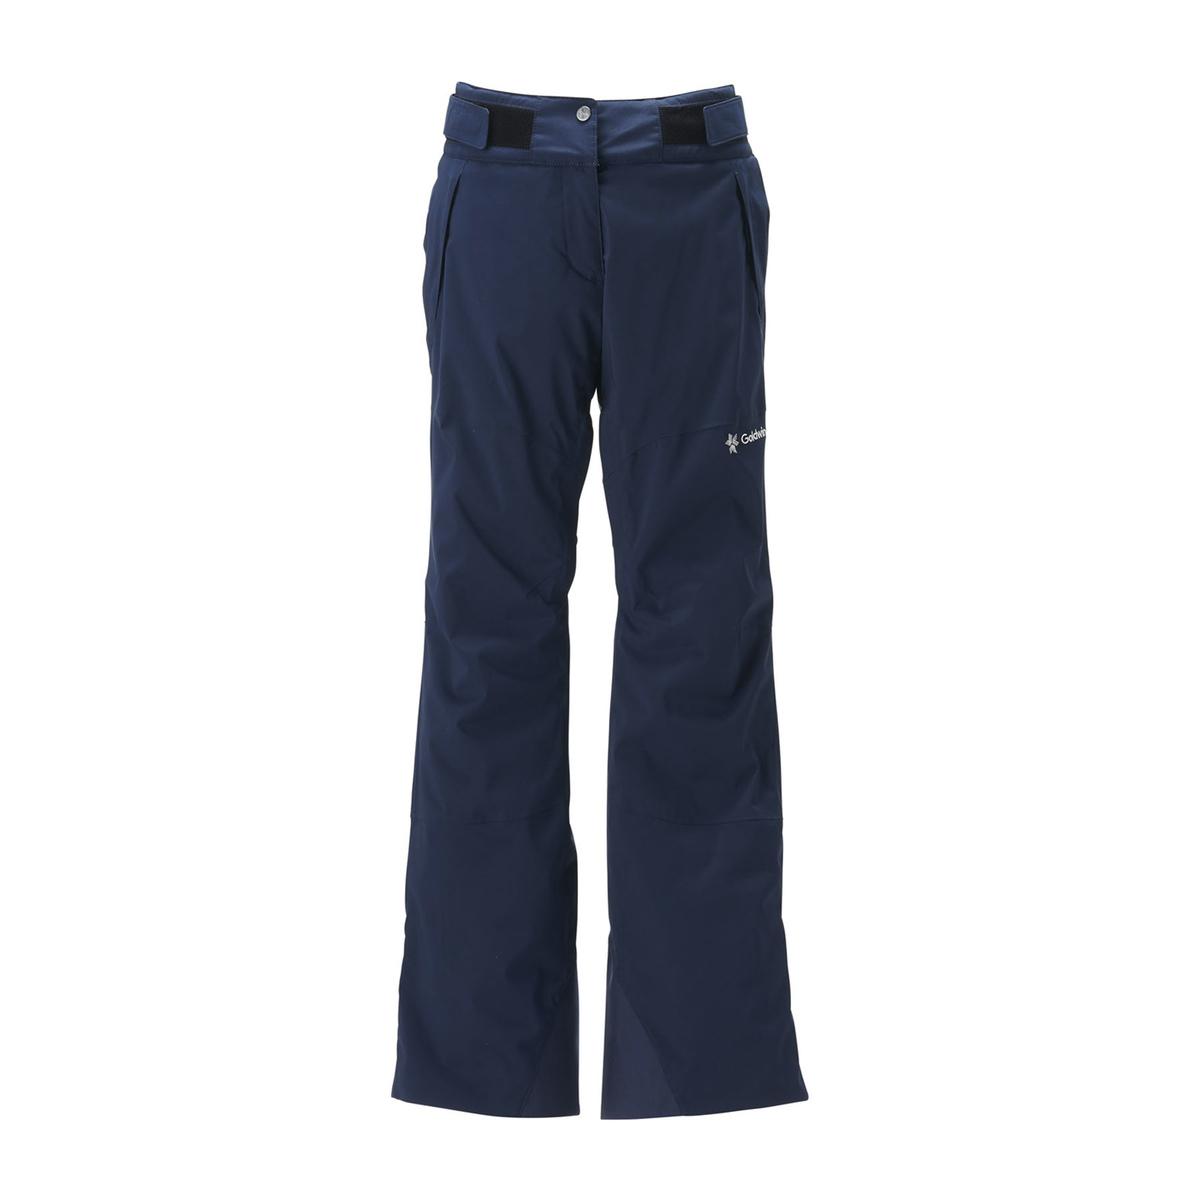 Prezzi Goldwin pantaloni IRIS donna